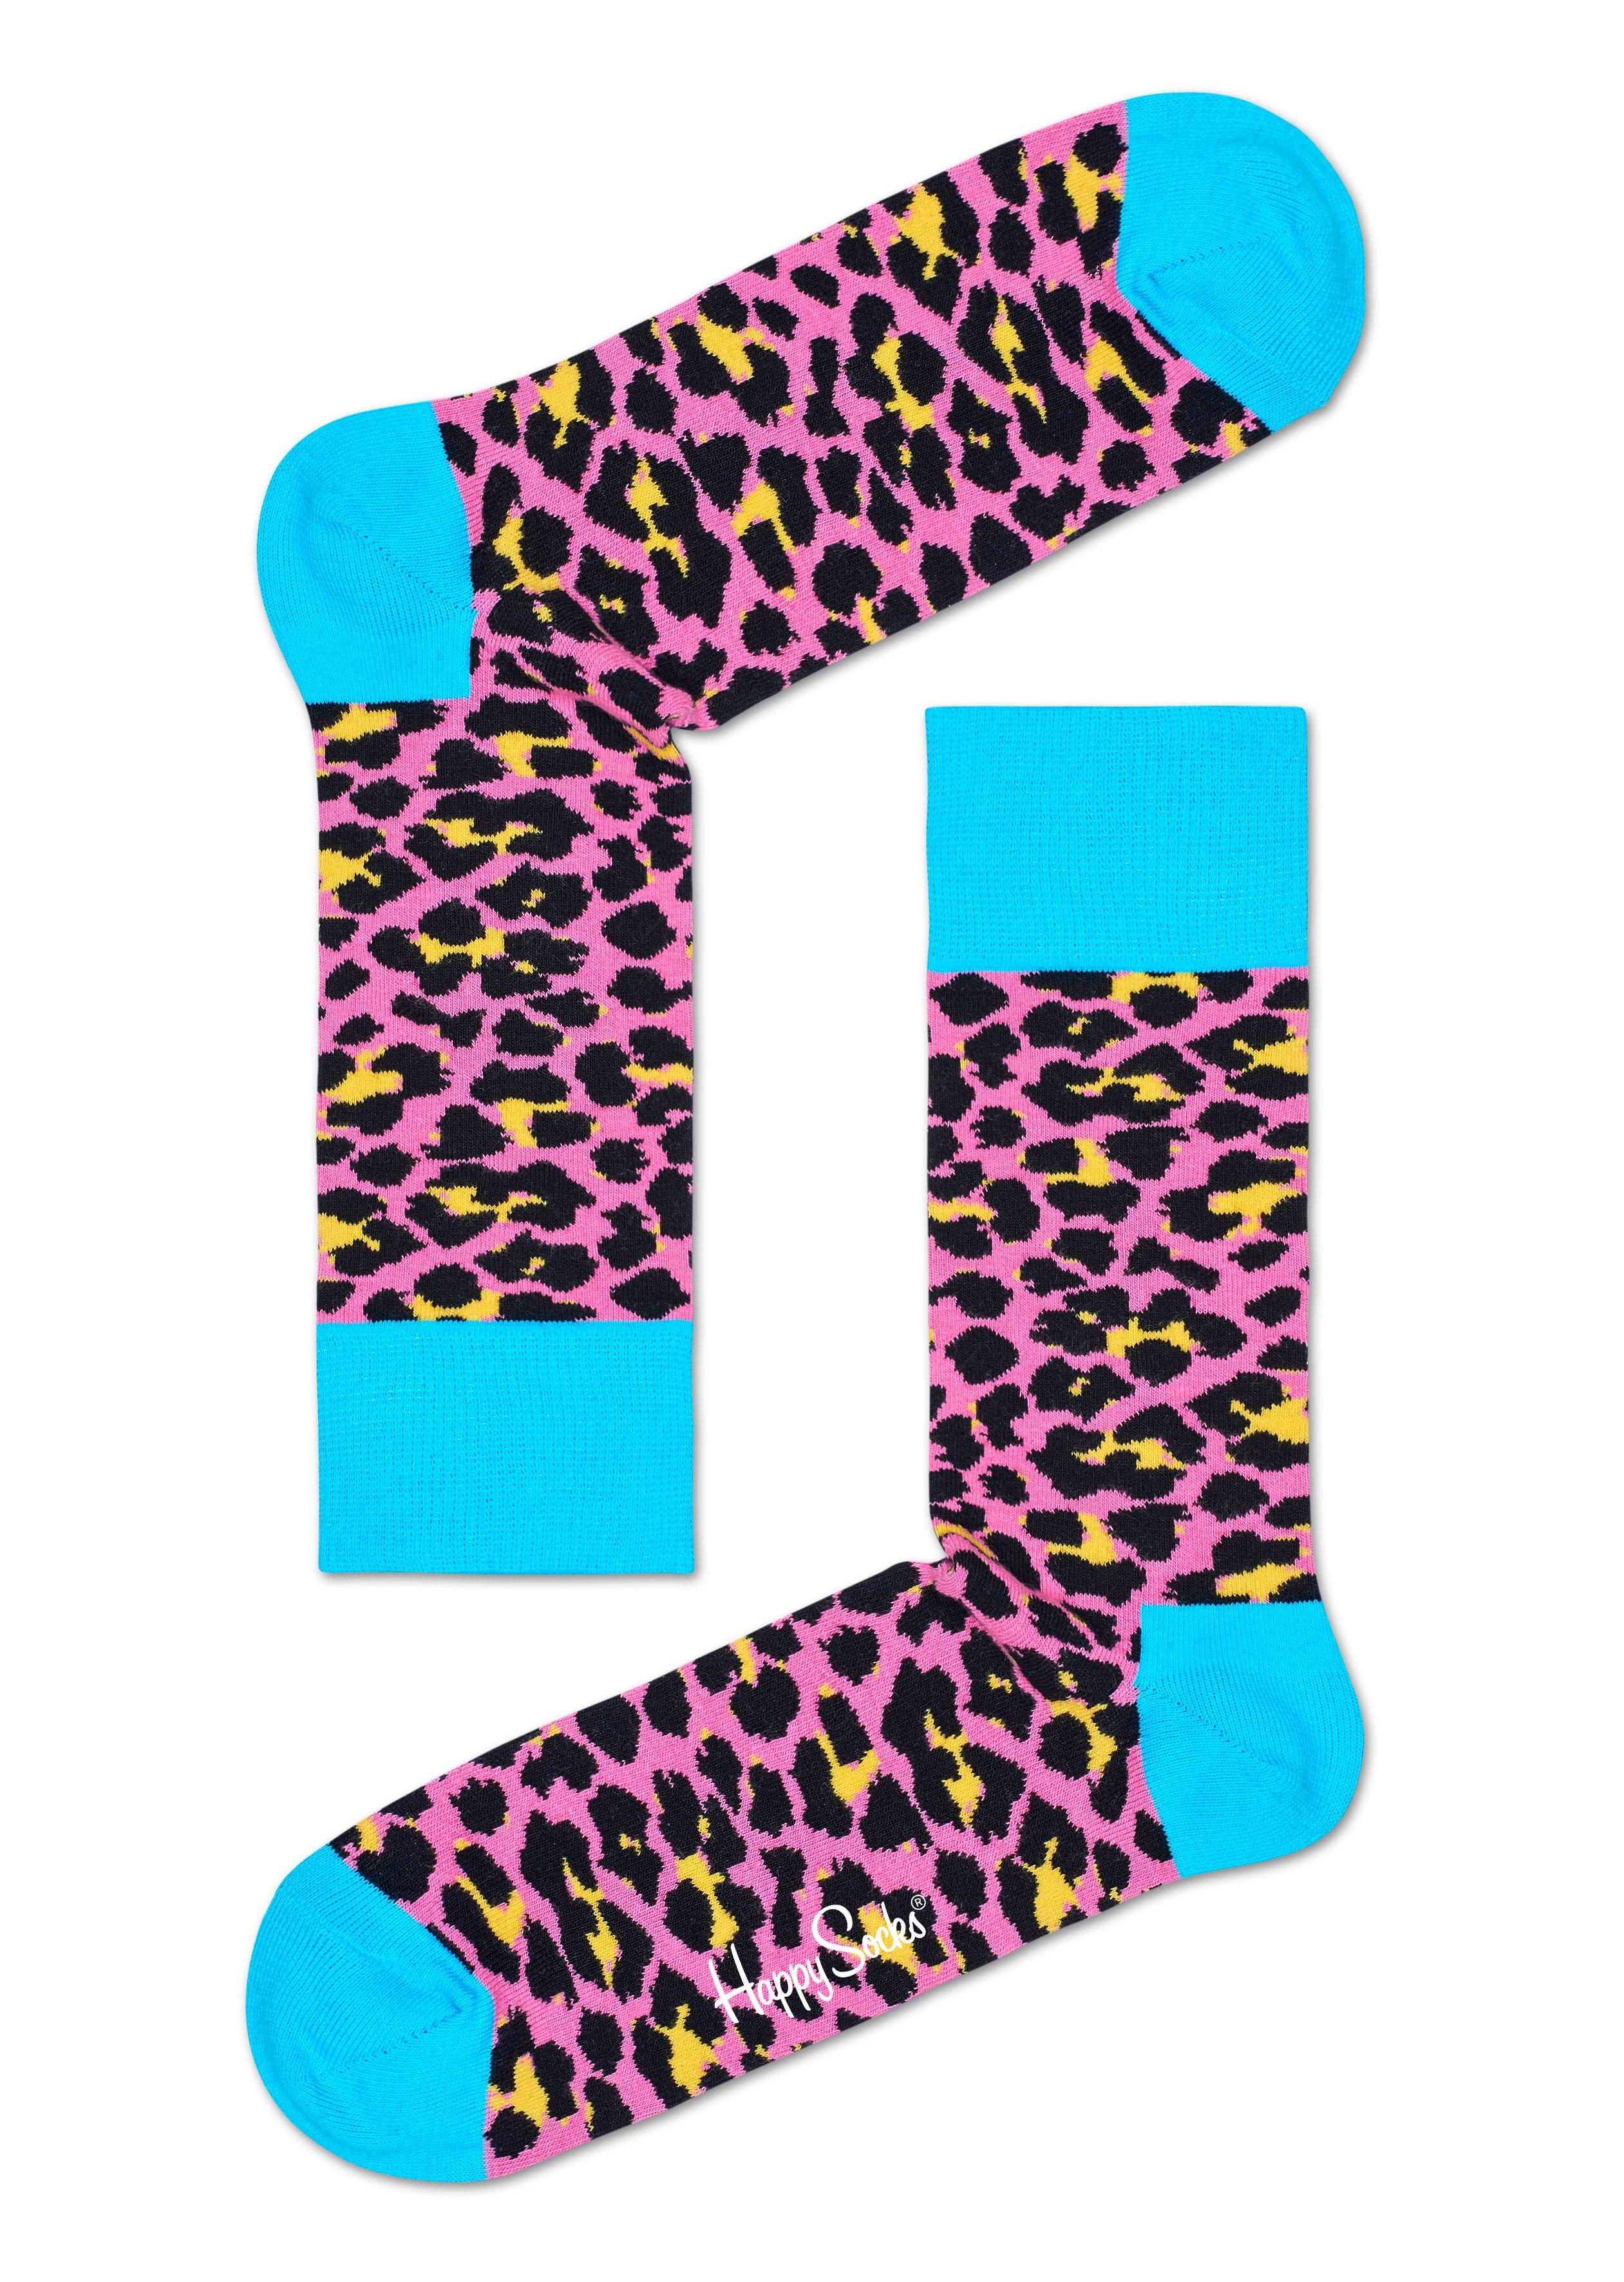 Fotografie Růžové ponožky Happy Socks s barevným vzorem Leopard-S-M (36-40)